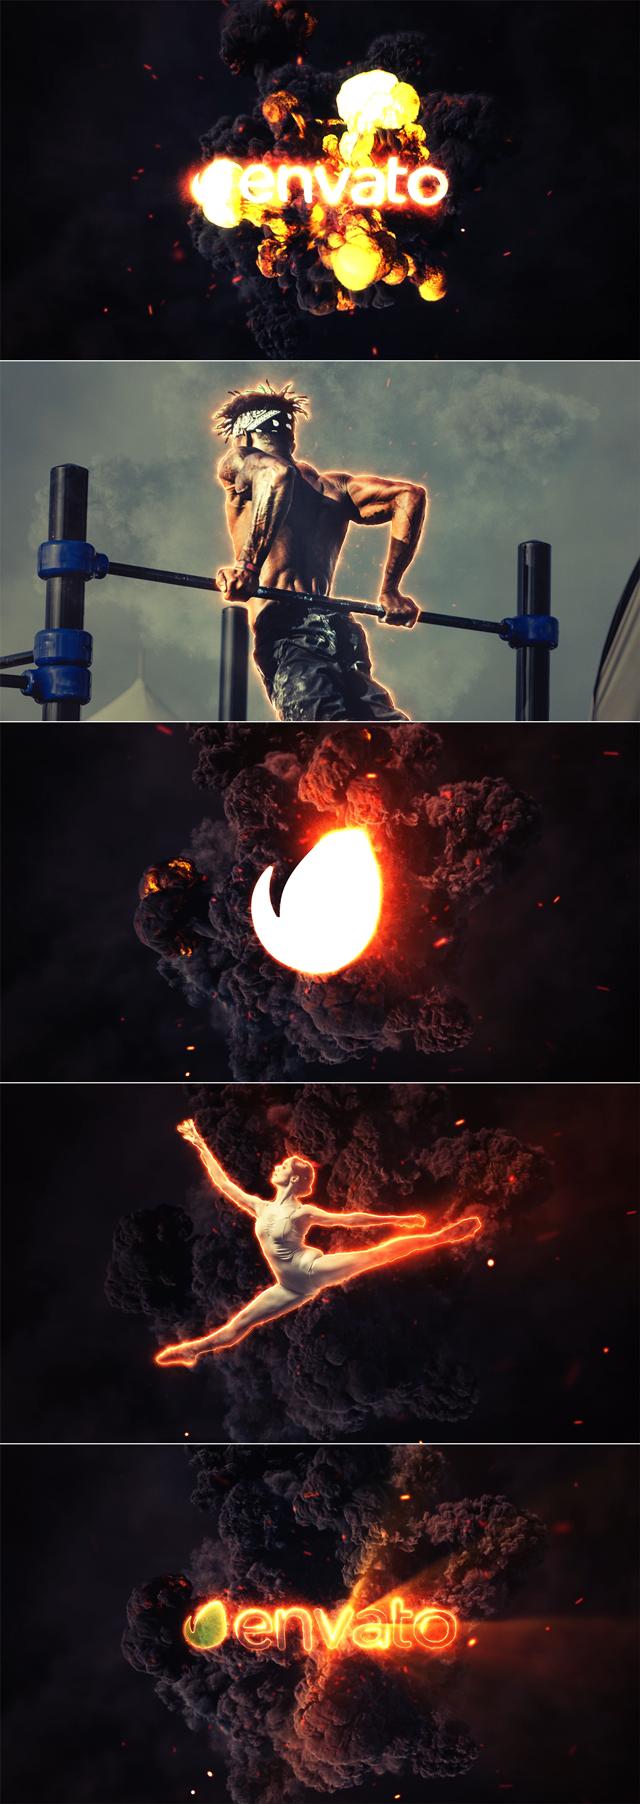 AE模板 大气震撼火焰燃烧爆炸背景logo动画 Videohive Fire Explosion Logo & Photo Animation免费下载